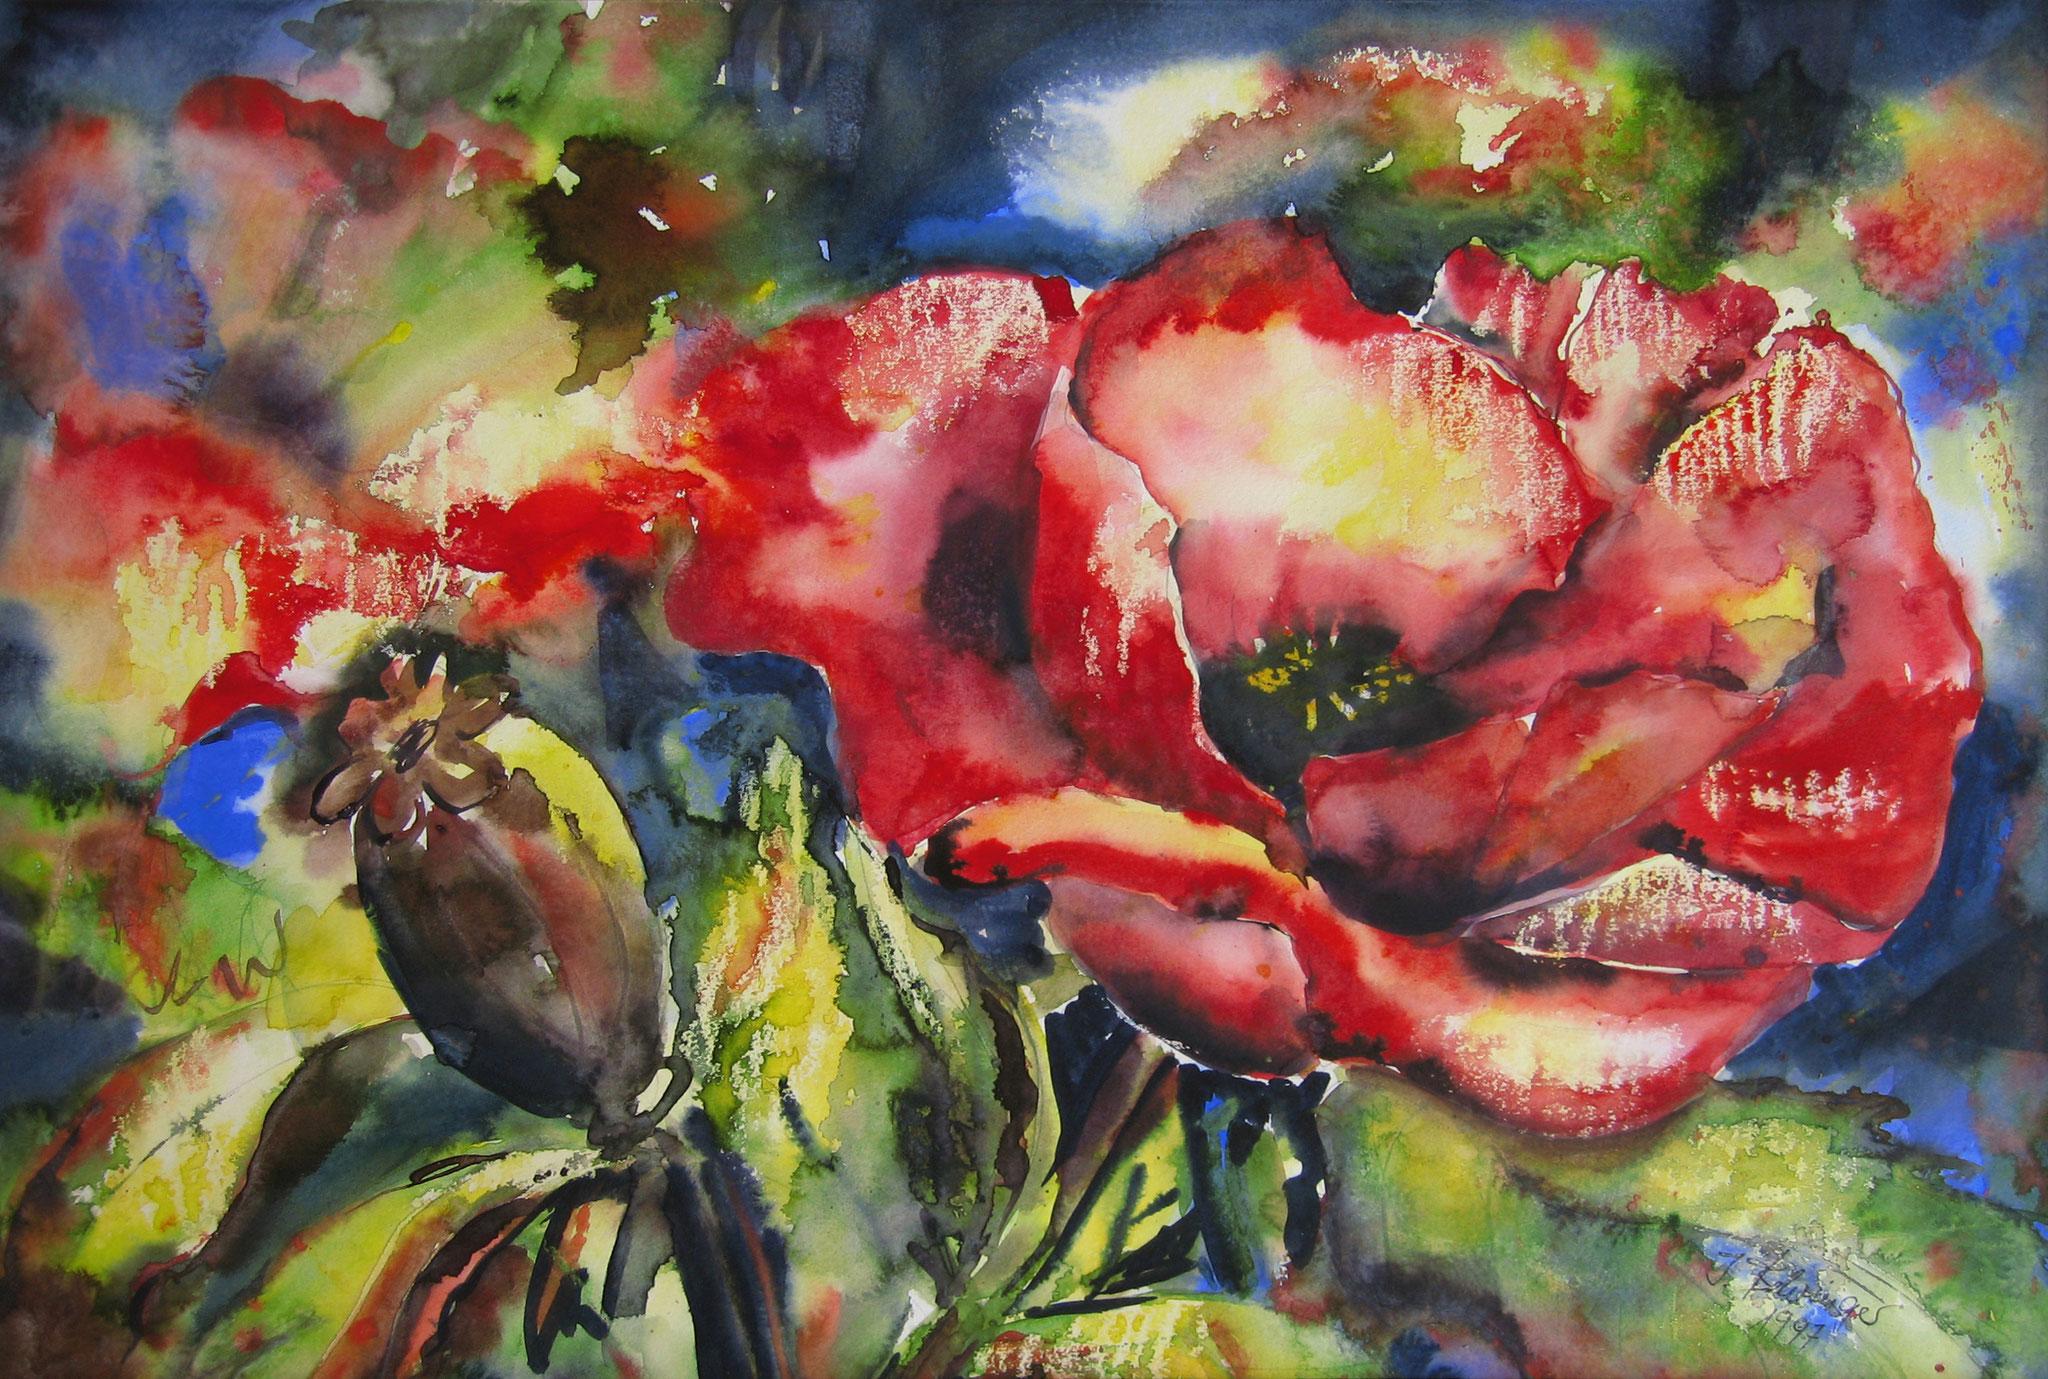 Roter Mohn, Aquarell, 42 x 62 cm